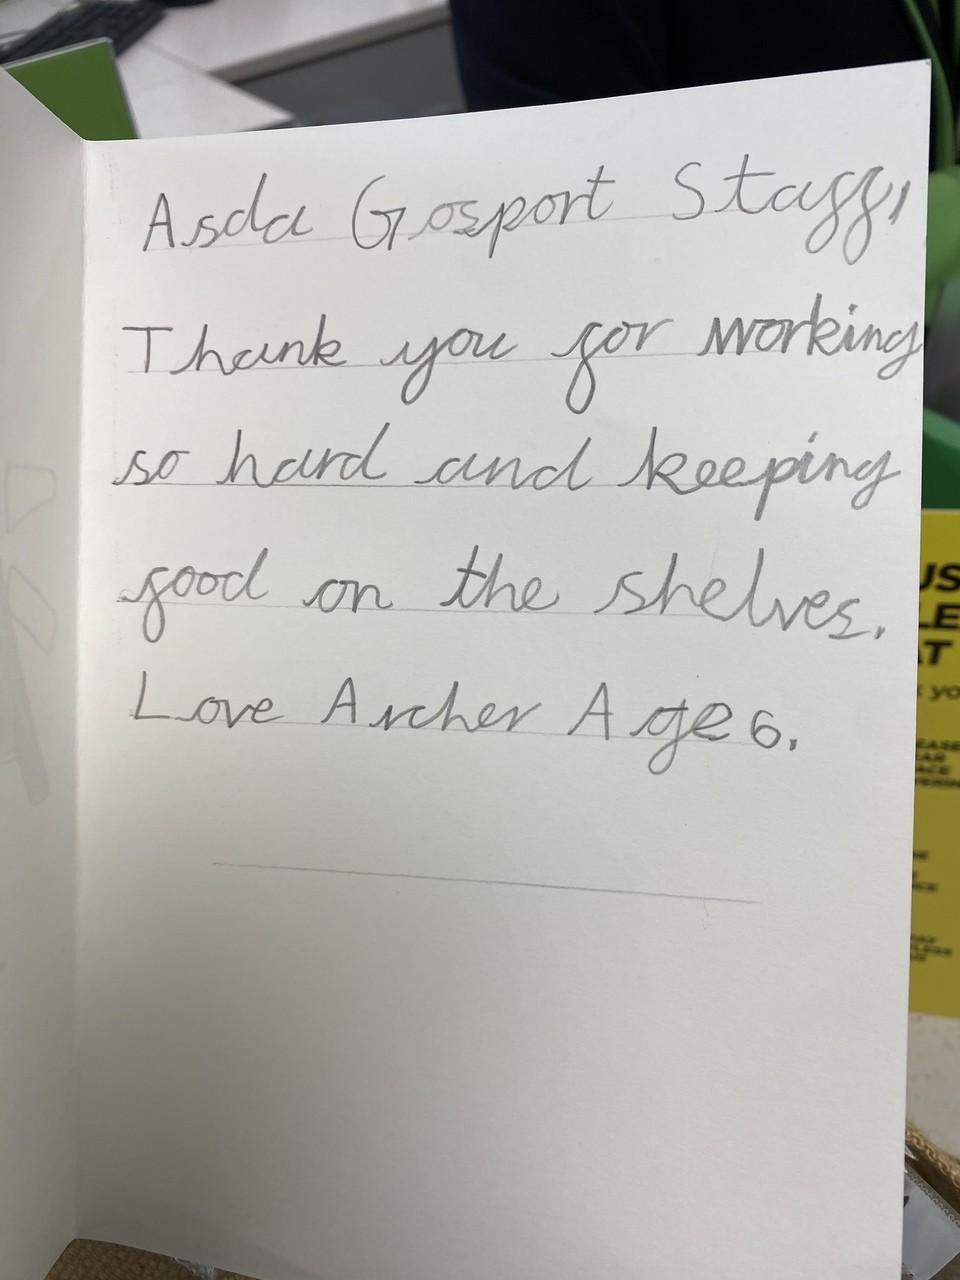 A little thanks goes a long way. | Asda Gosport